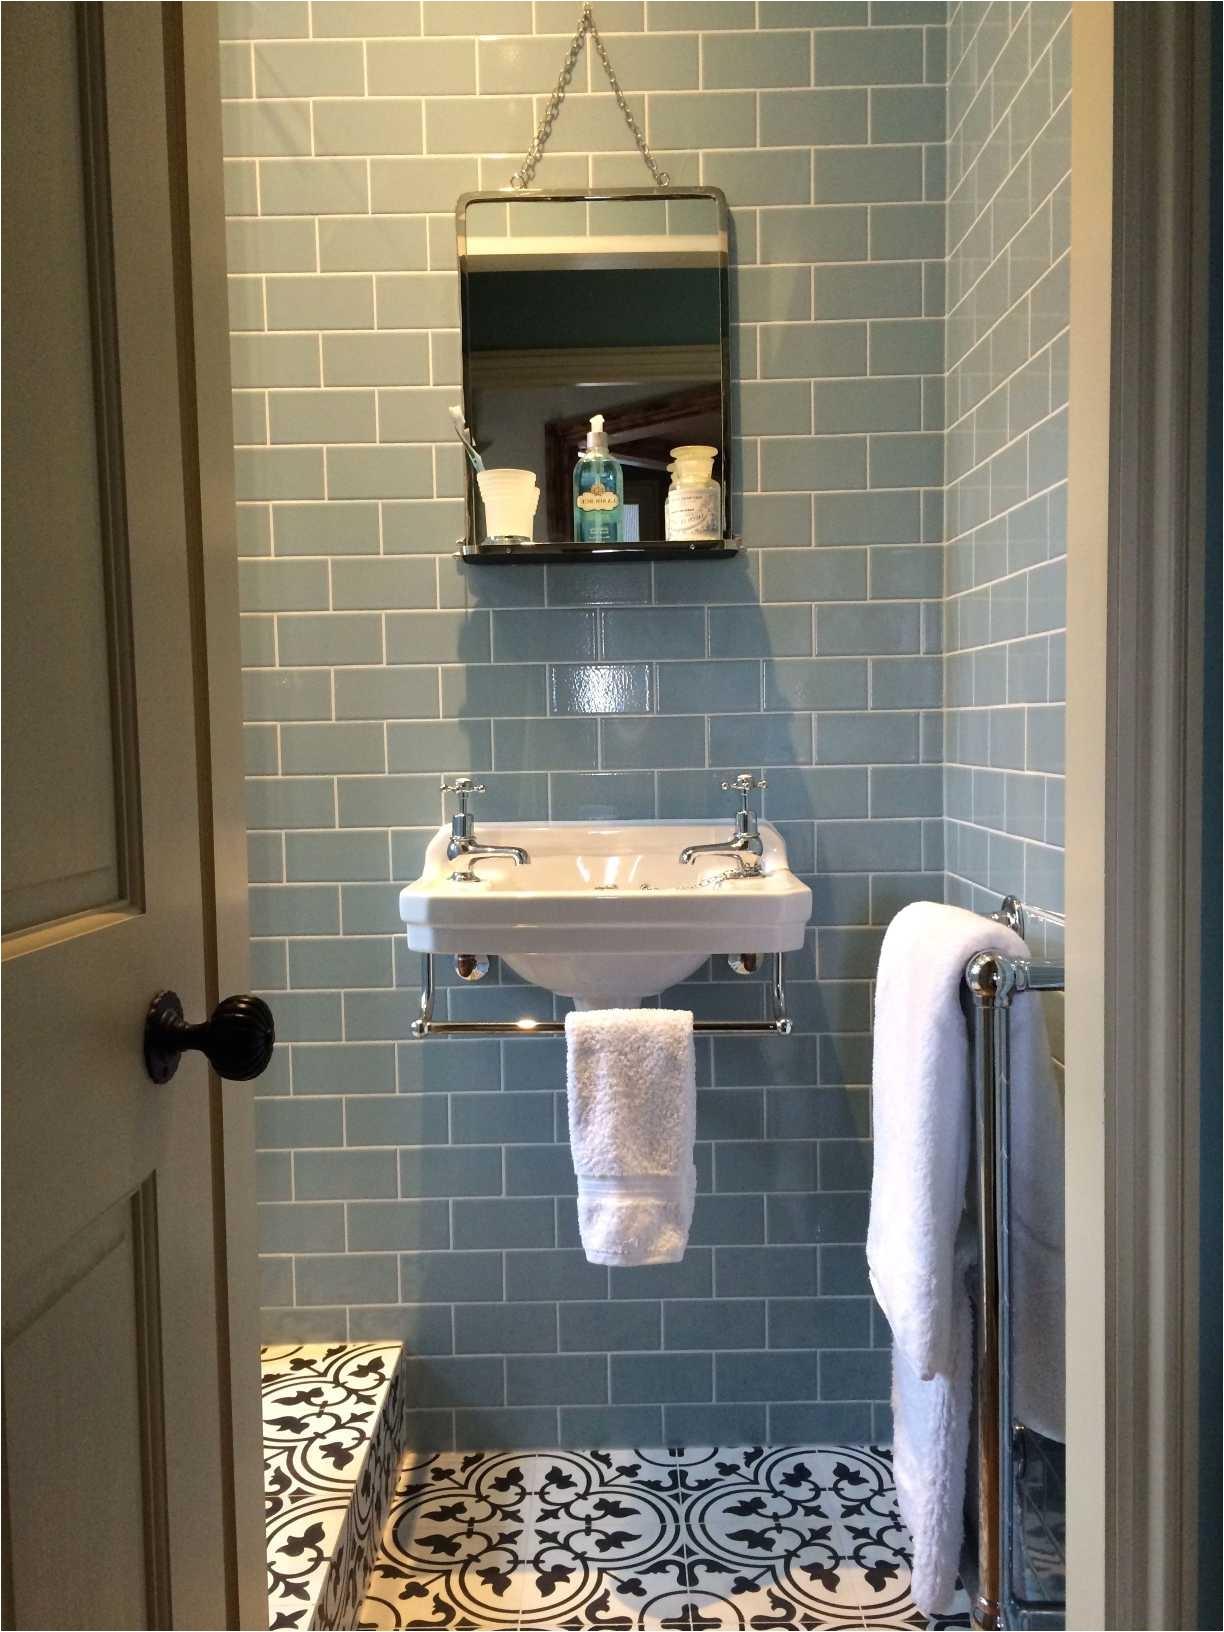 best bathtub faucet set h sink bathroom faucets repair i 0d cool of shower vs bathtub